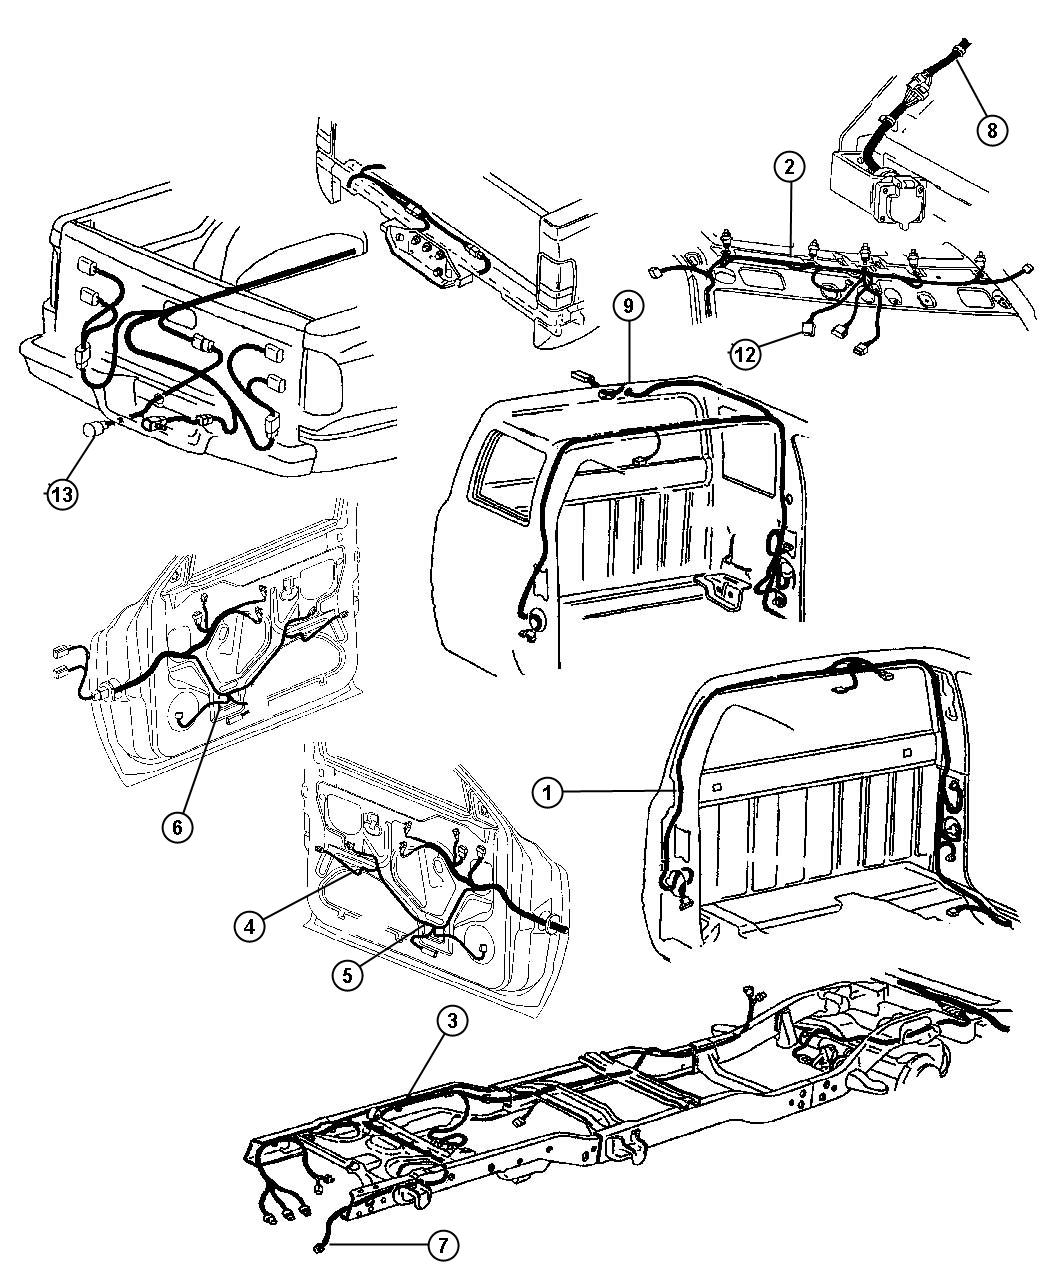 Ford ranger fuel pump problems together with 2005 chrysler pacifica v6 3 8l serpentine belt diagram